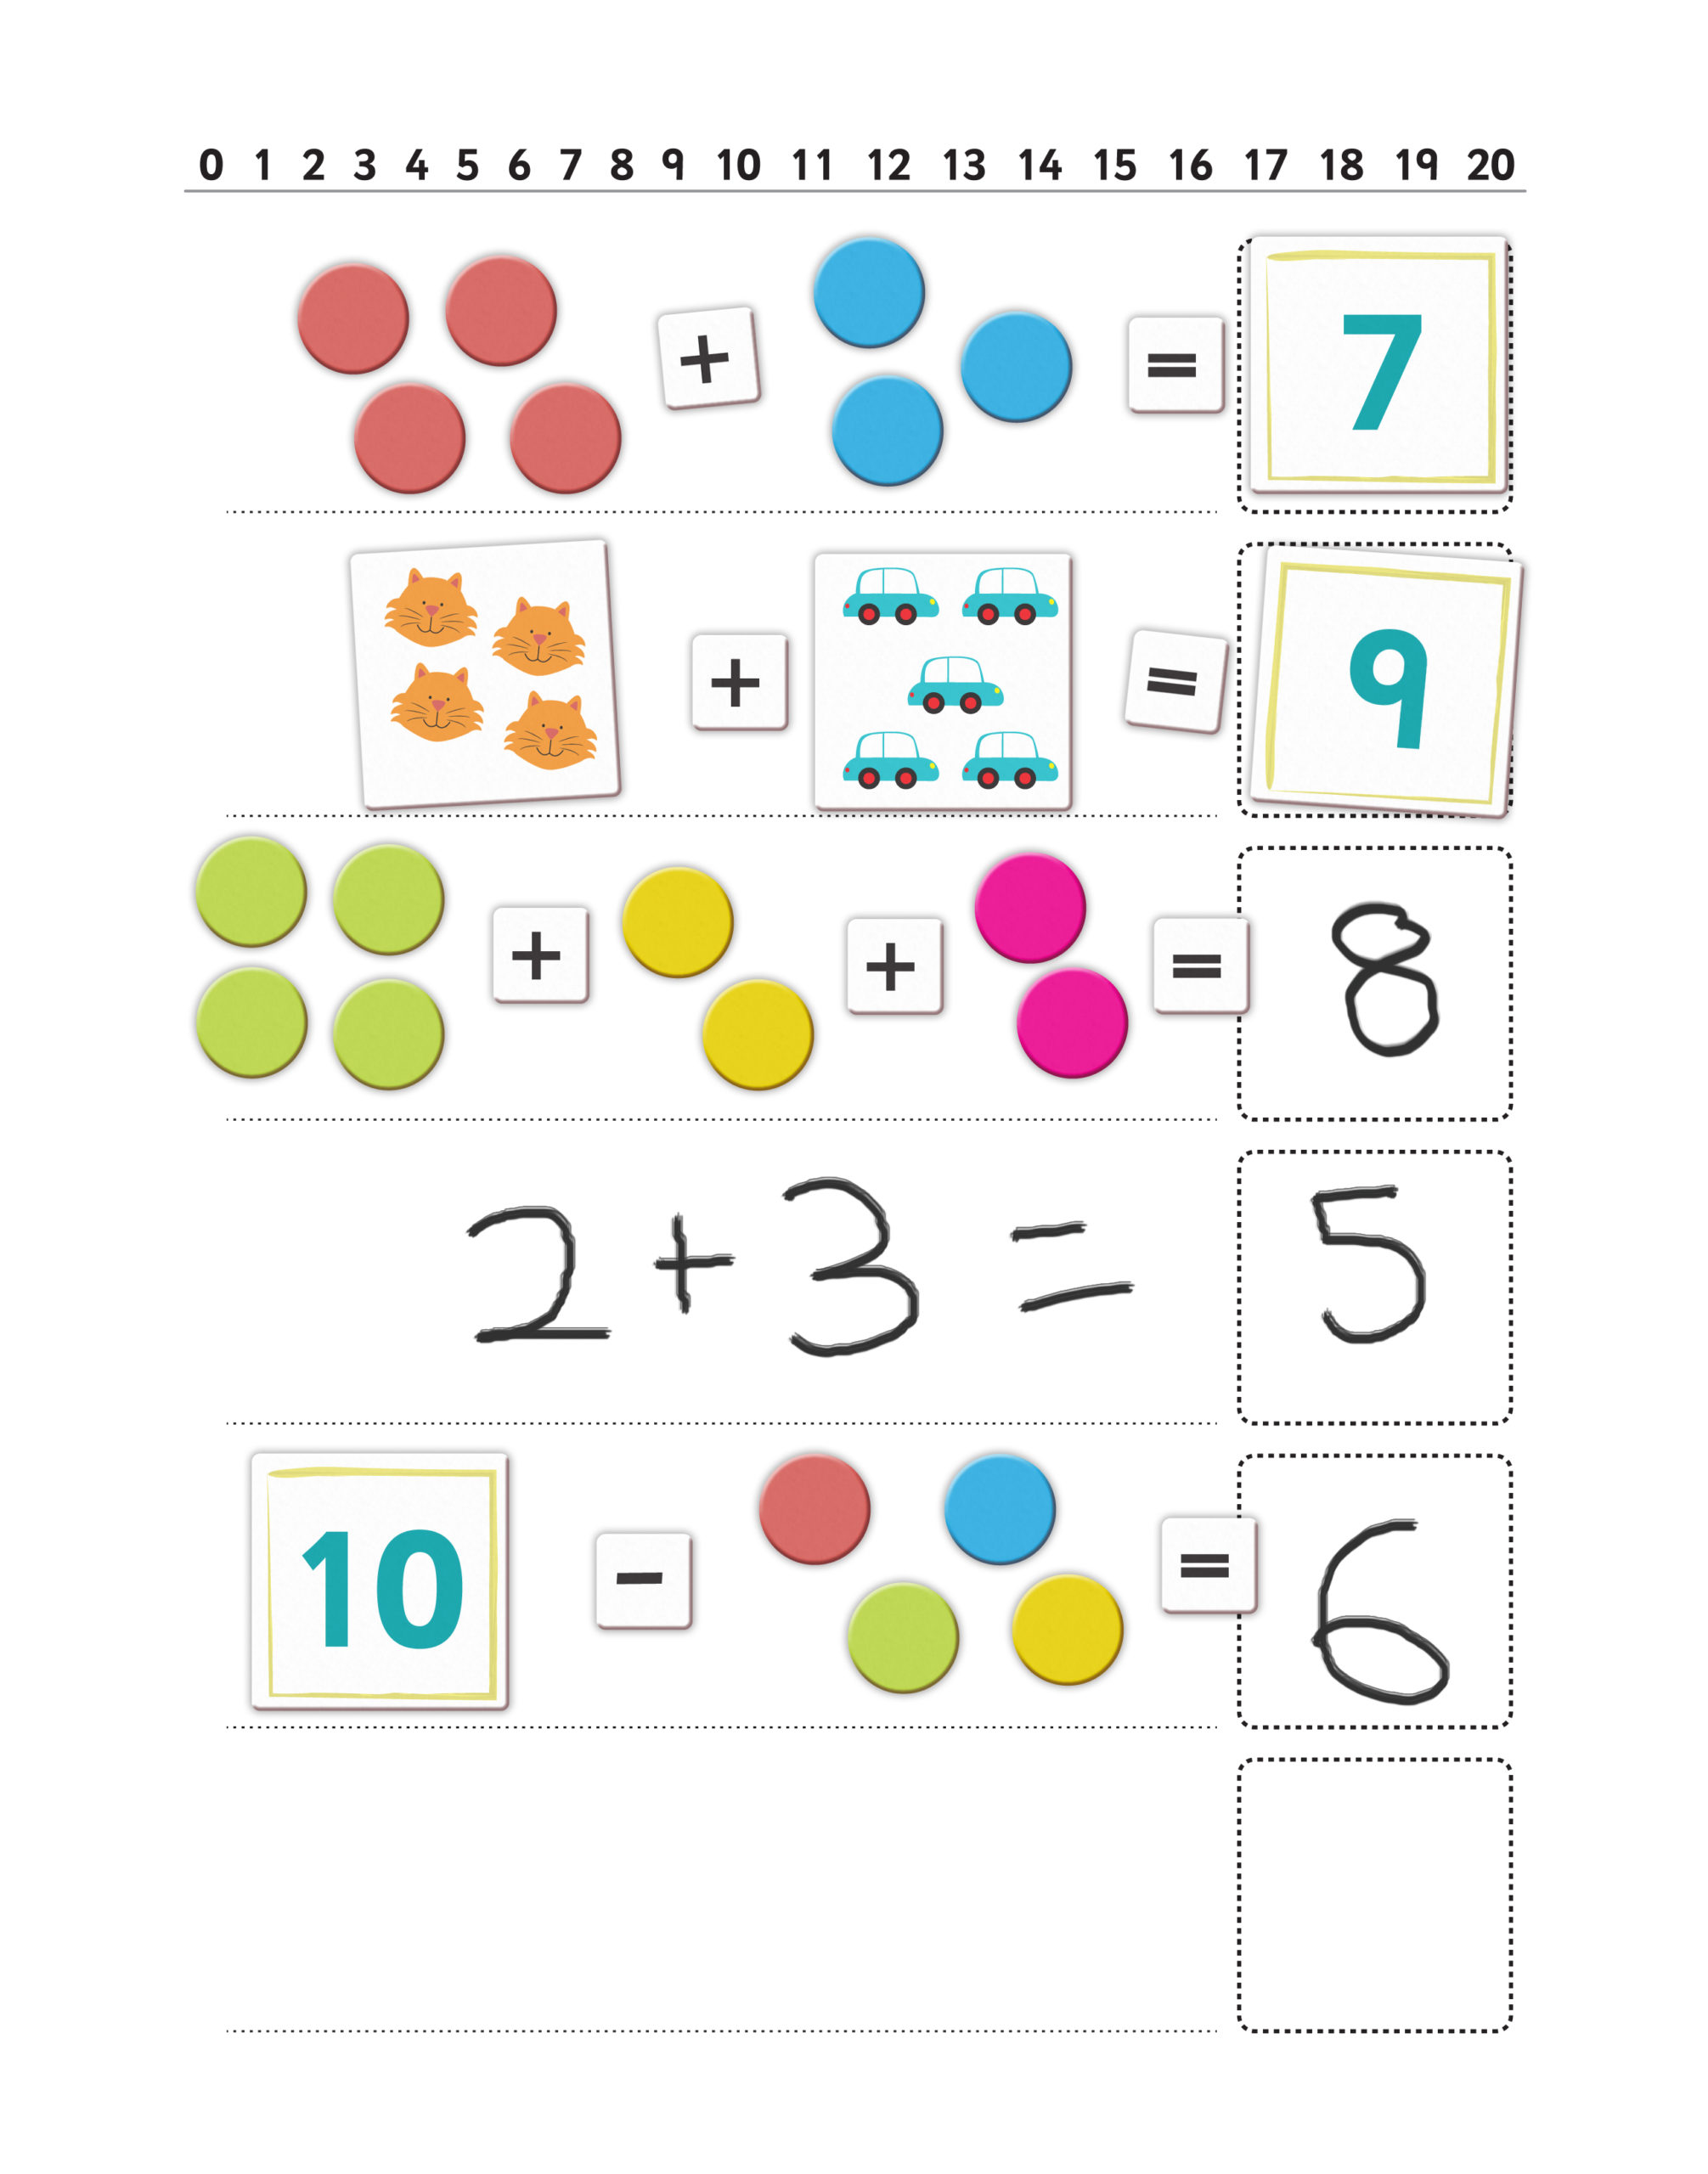 First maths sum board scaled